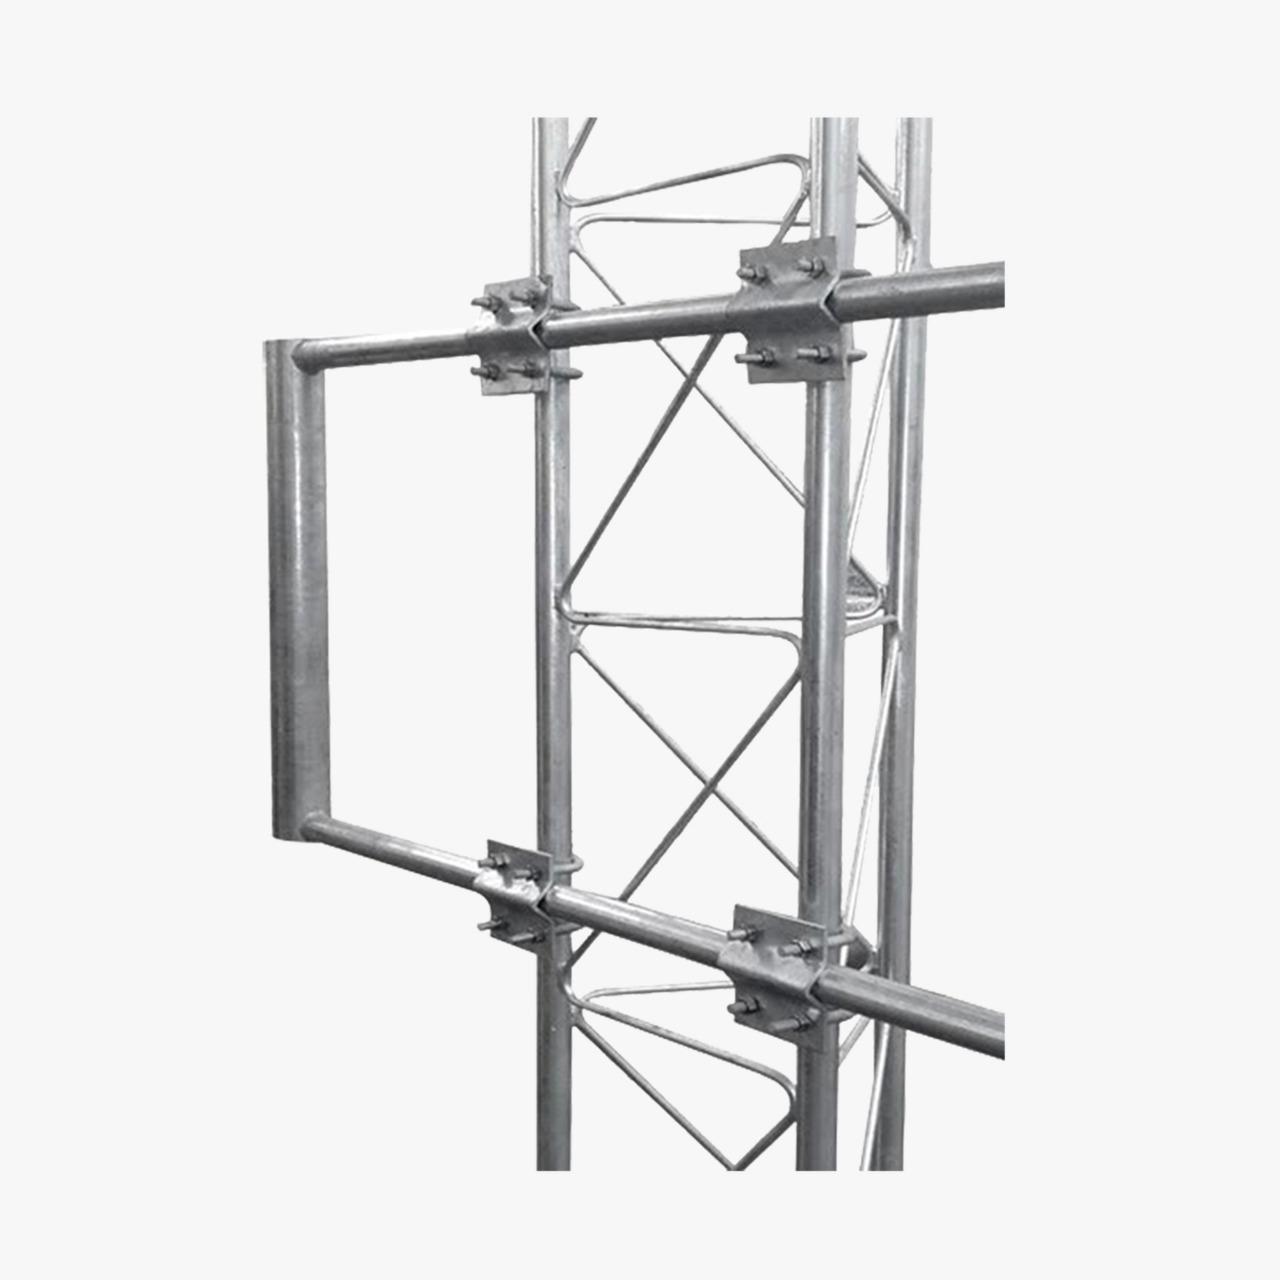 Soporte Para Antenas Sectoriales Tipo 2 Pcenter Per 250 Sac